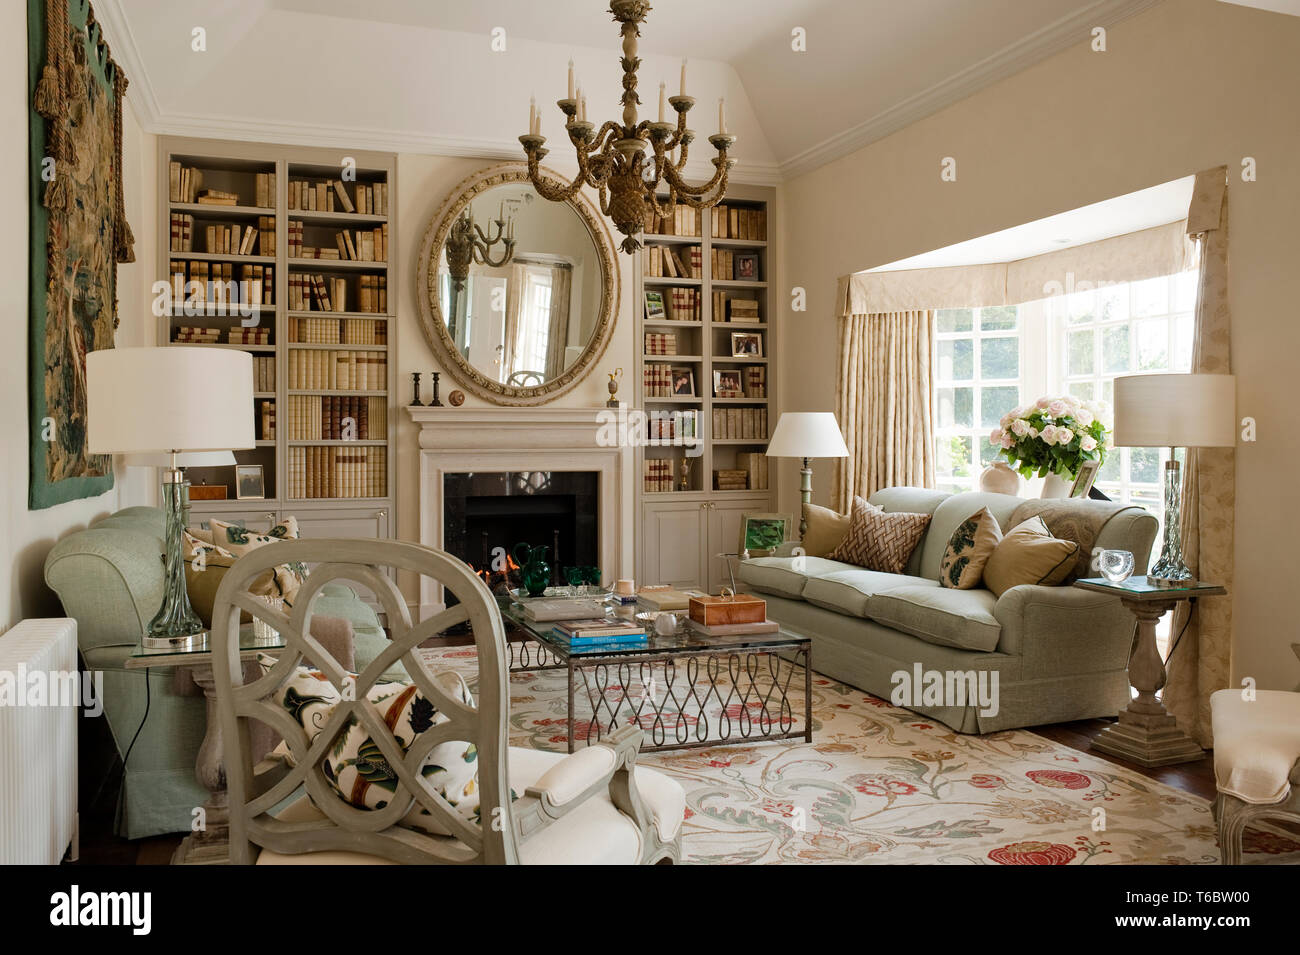 Georgian Style Living Room Stock Photo 244894160 Alamy